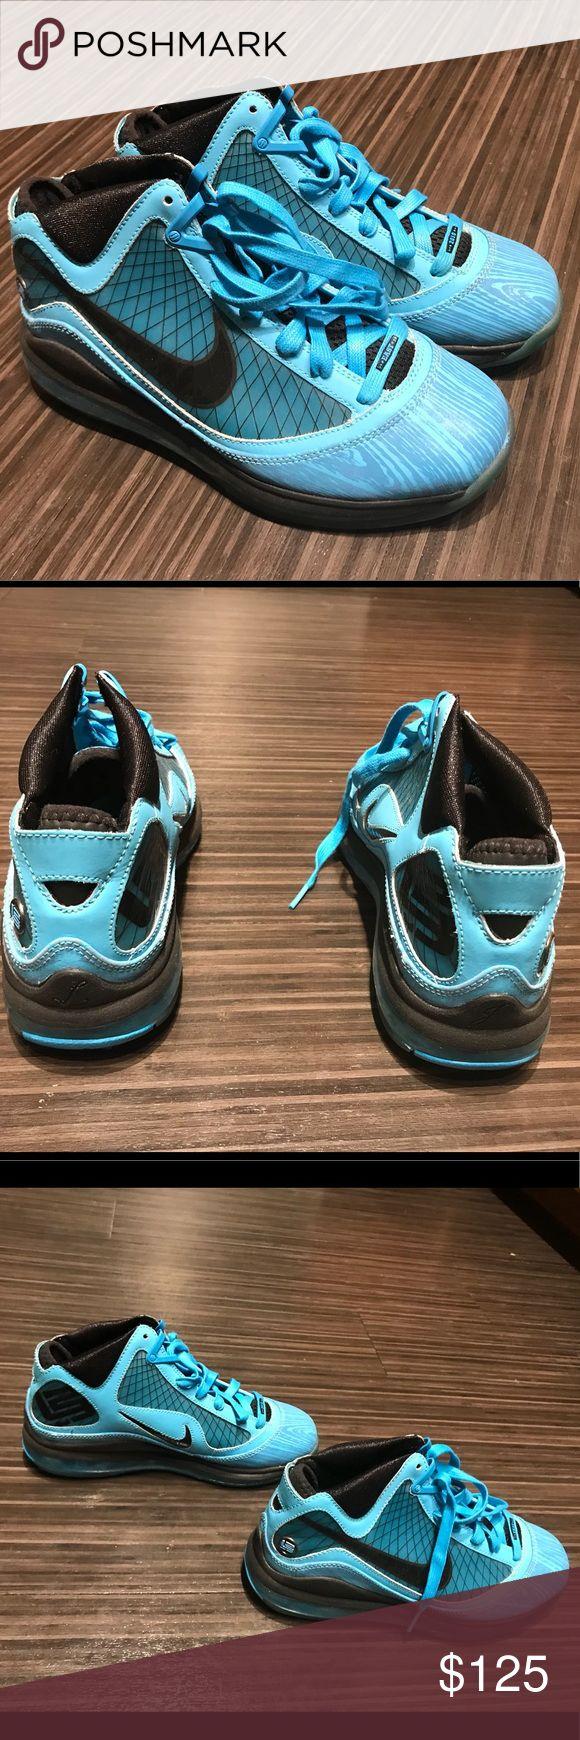 Air Max Lebron 7 'All Star' Chlorine Blue/ Black- Copa Nike Shoes Sneakers